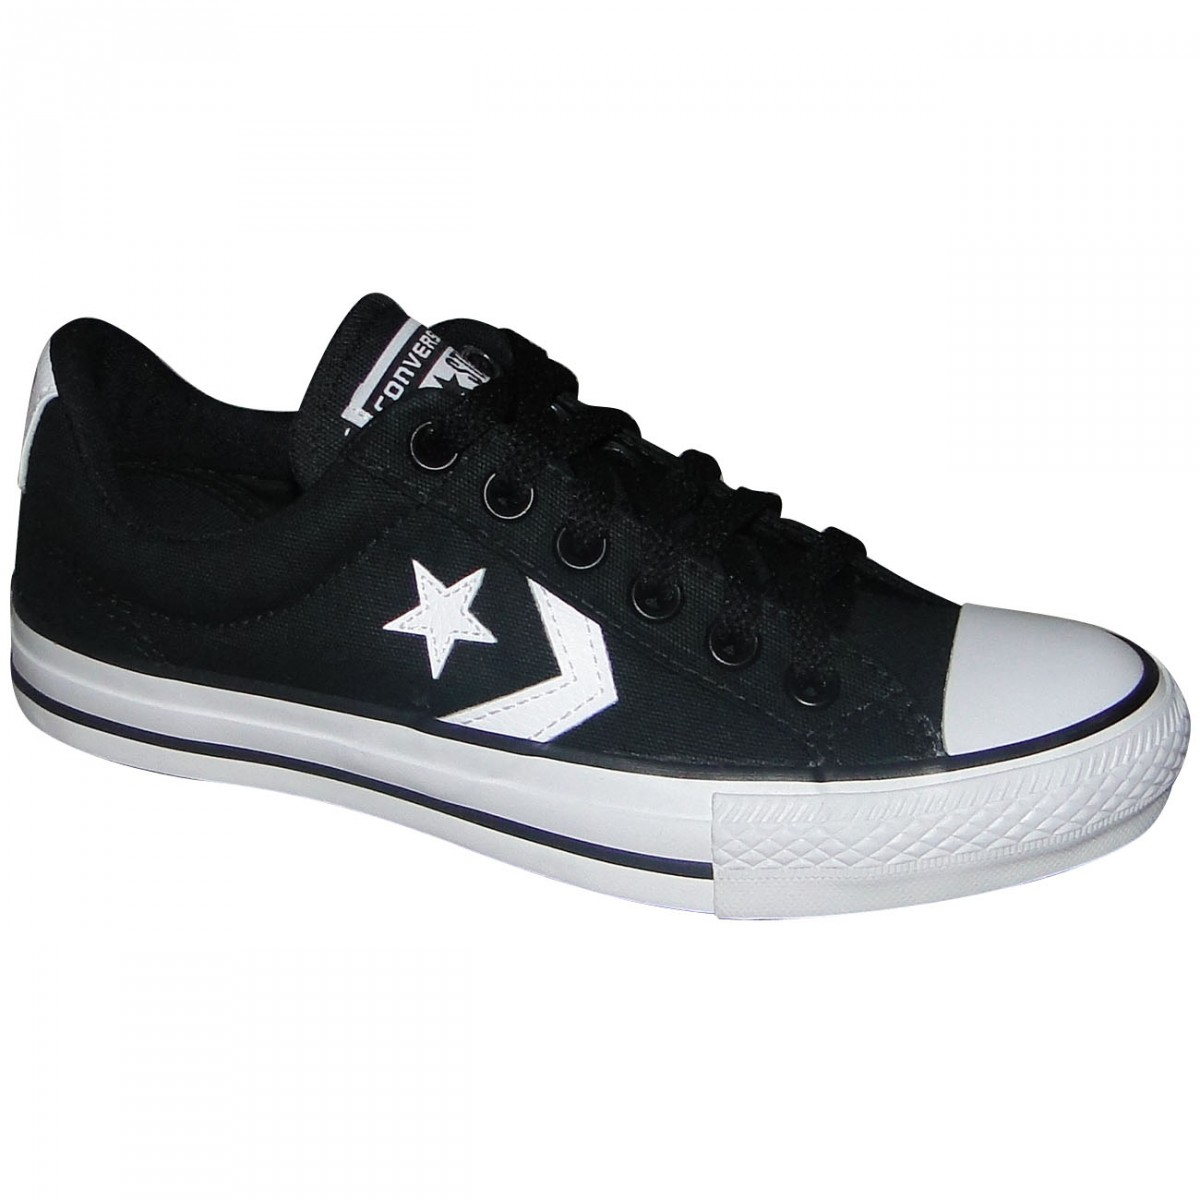 59451636d5 Tênis All Star Converse Star Player CO055001 - PRETO - Chuteira Nike ...